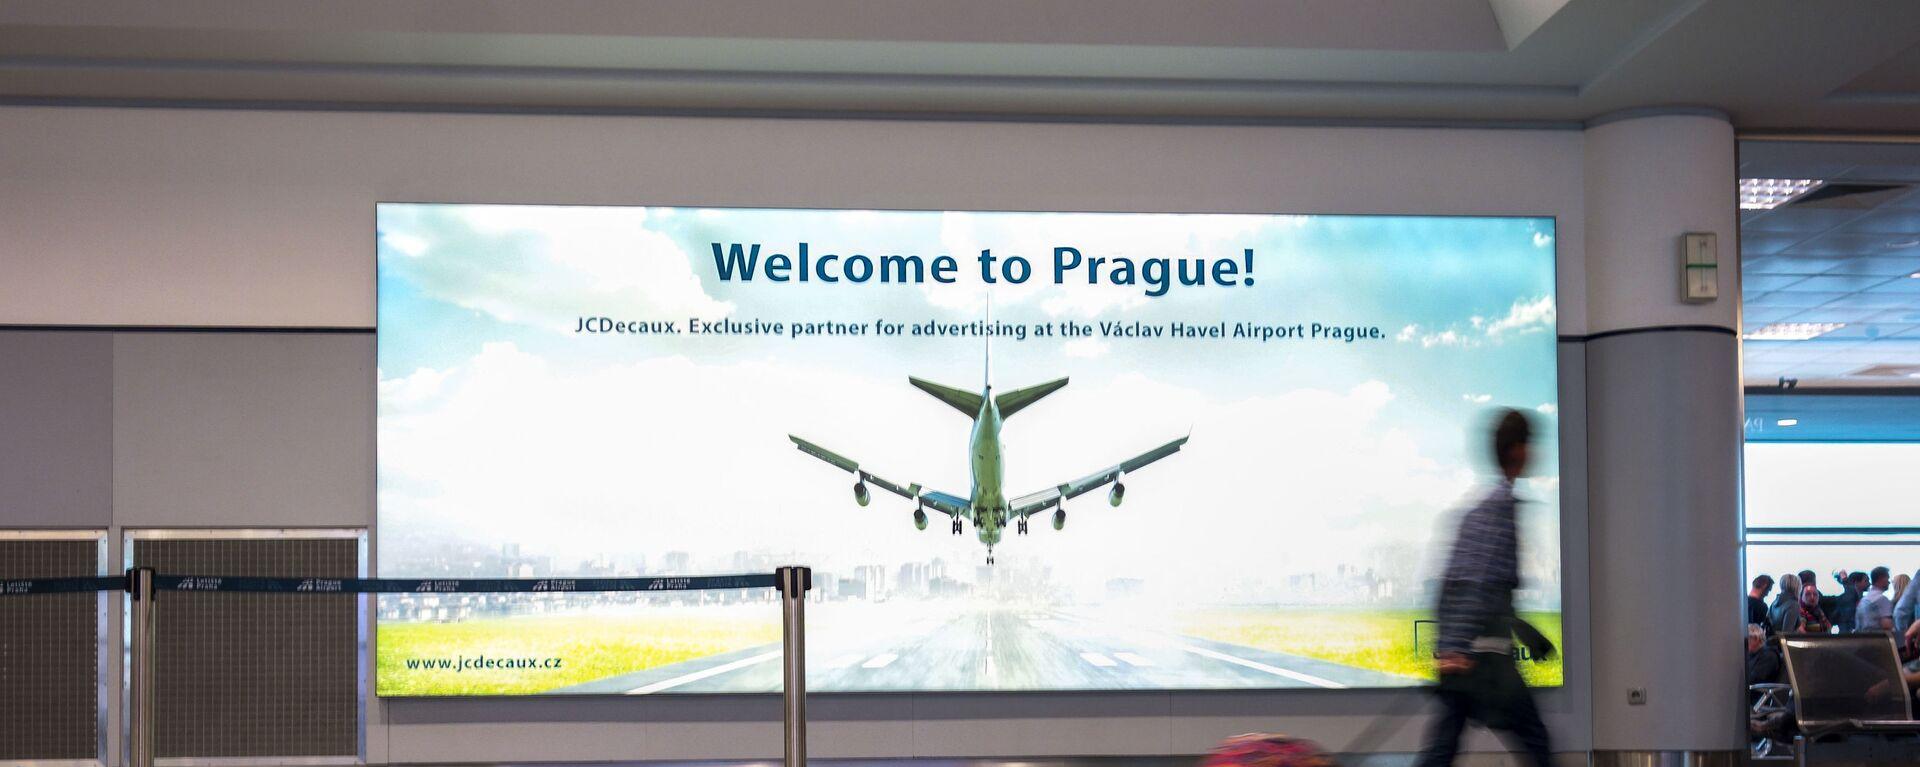 Port lotniczy Praga im. Václava Havla - Sputnik Polska, 1920, 12.09.2021